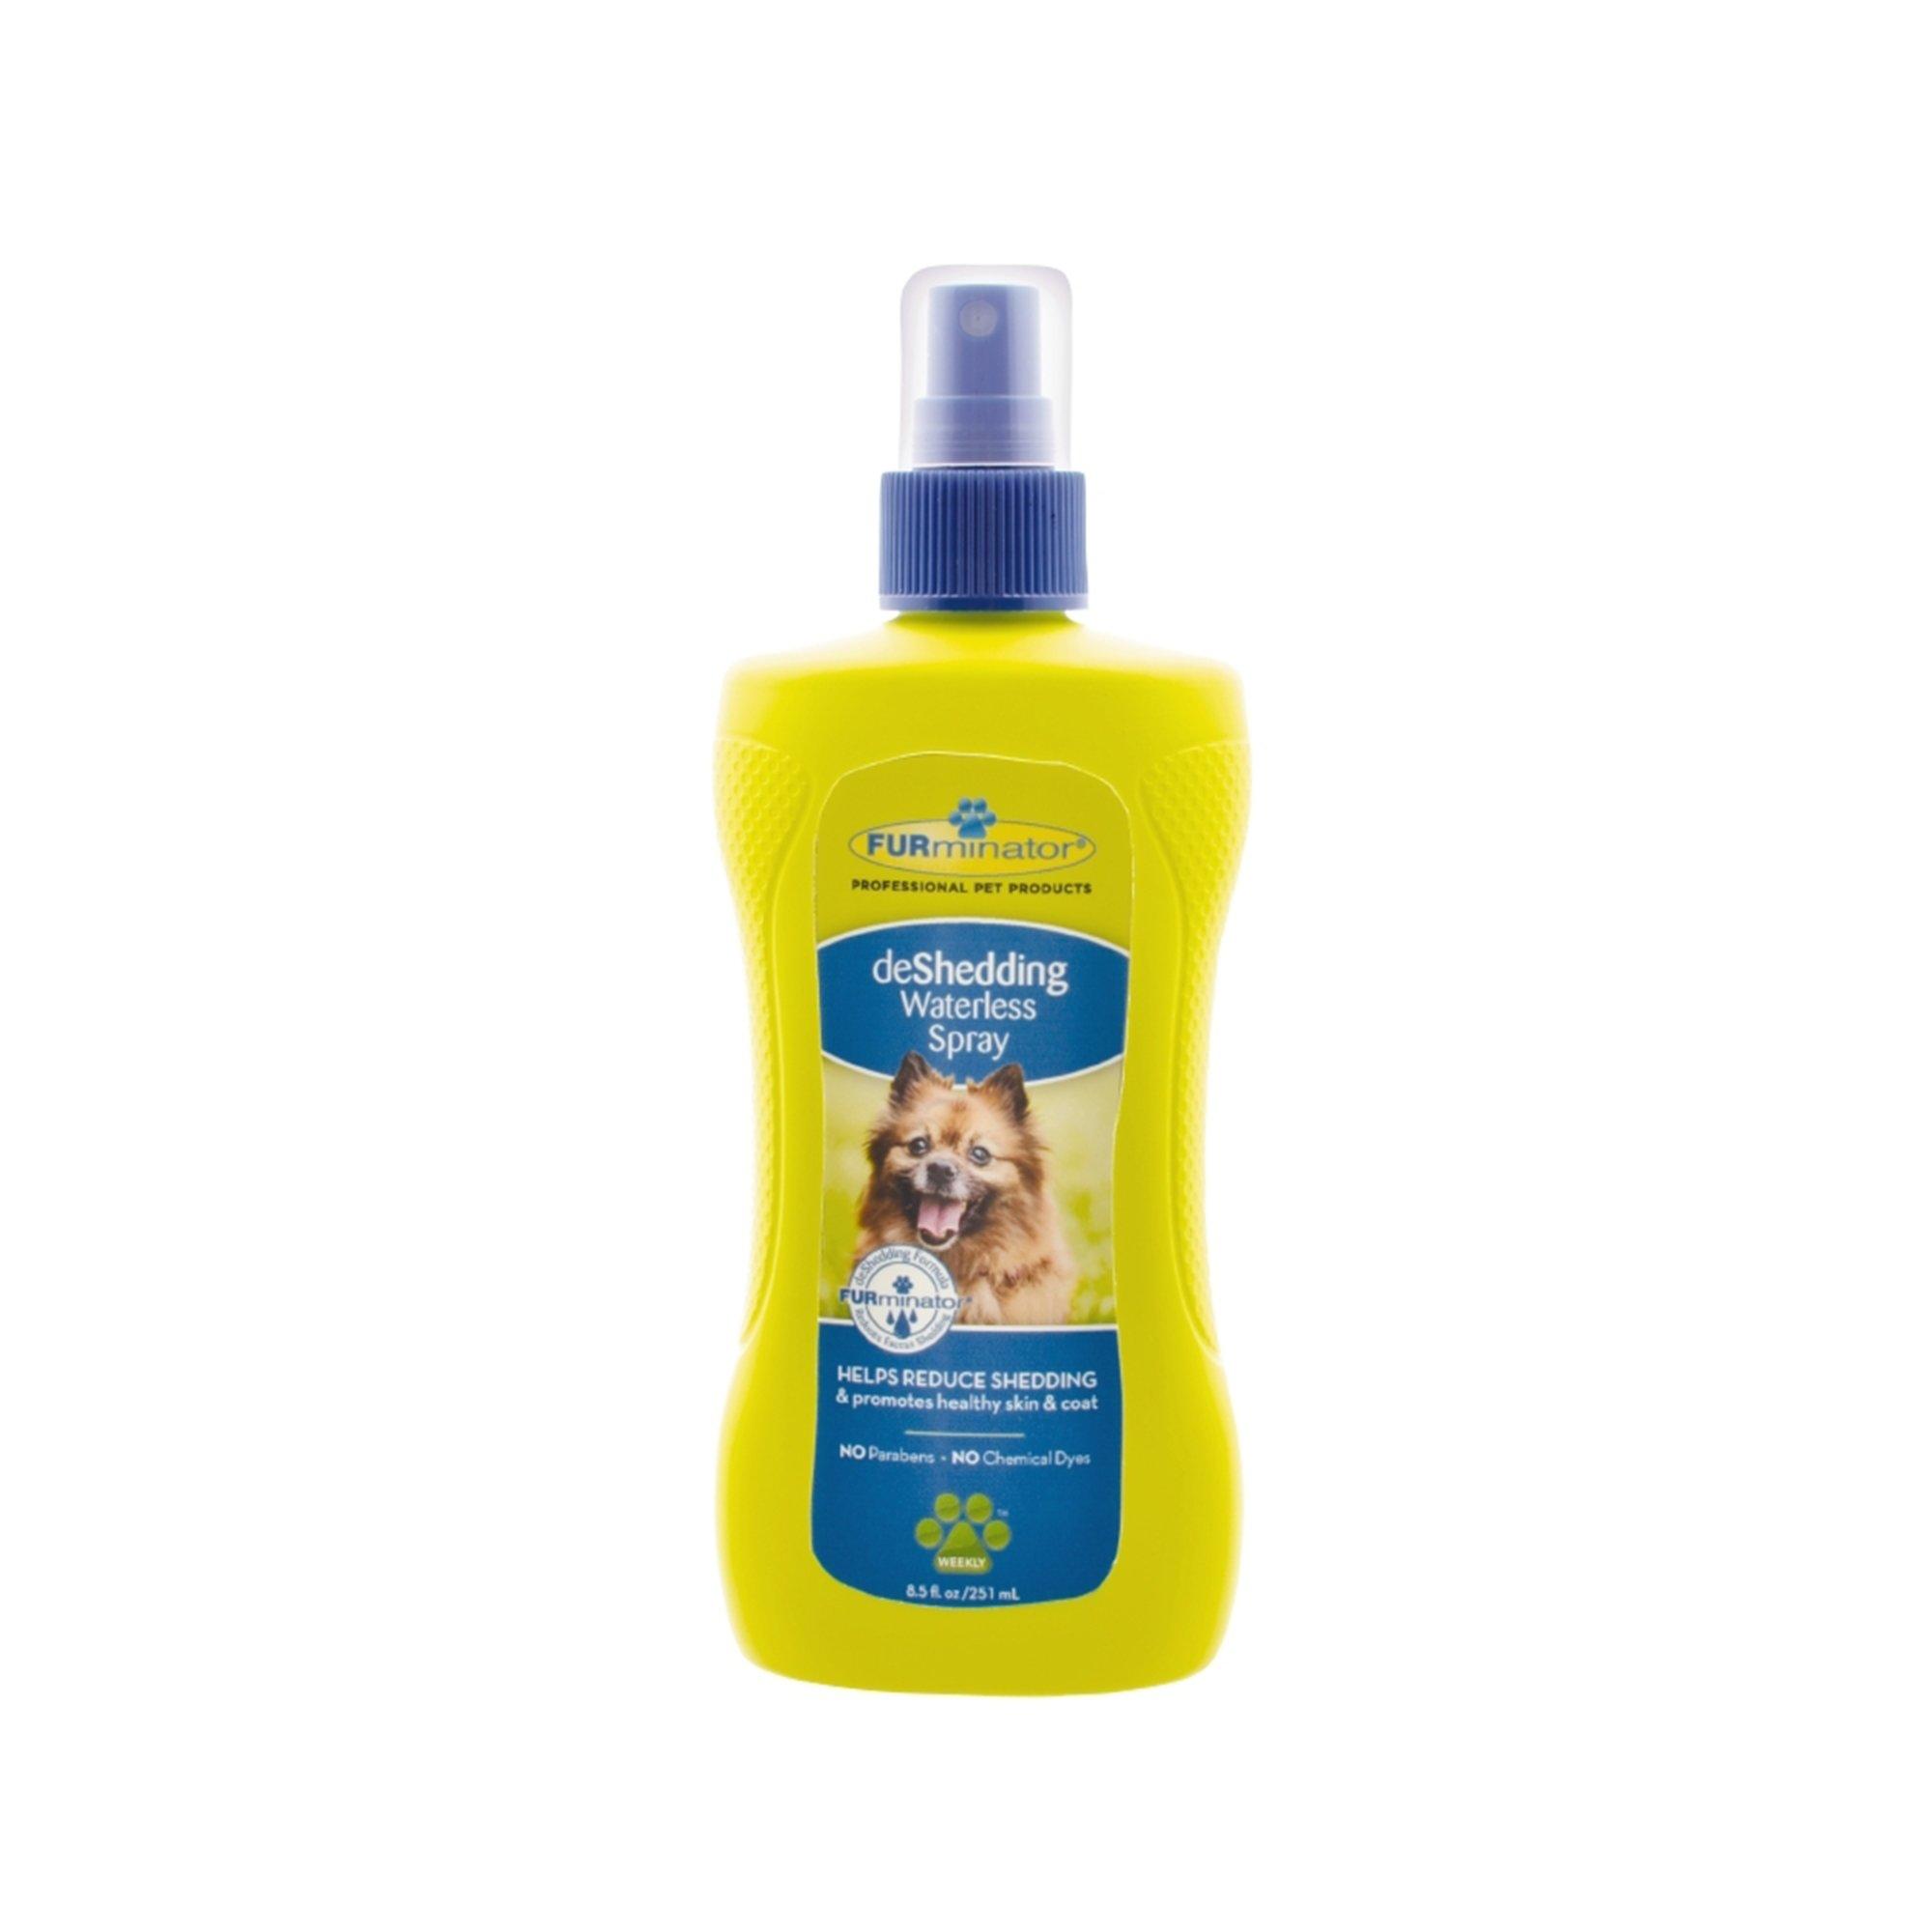 FURminator Pet Grooming Products   Petco